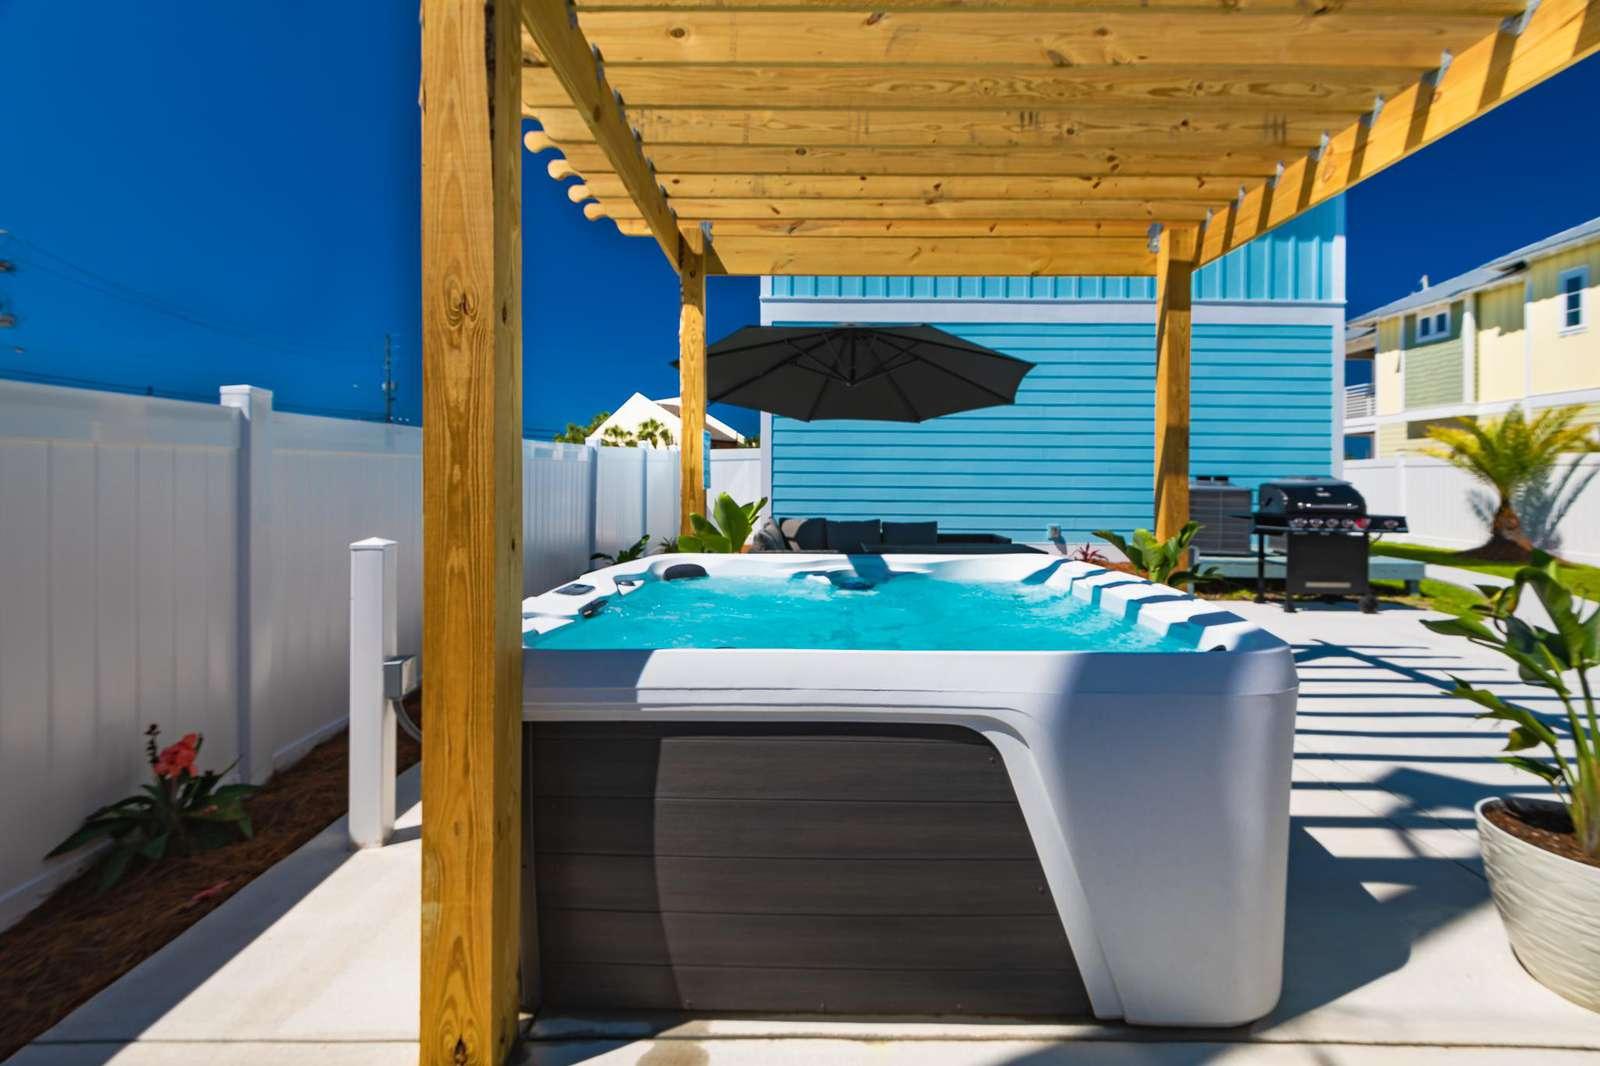 New pergola canopies the 7 person hot-tub!